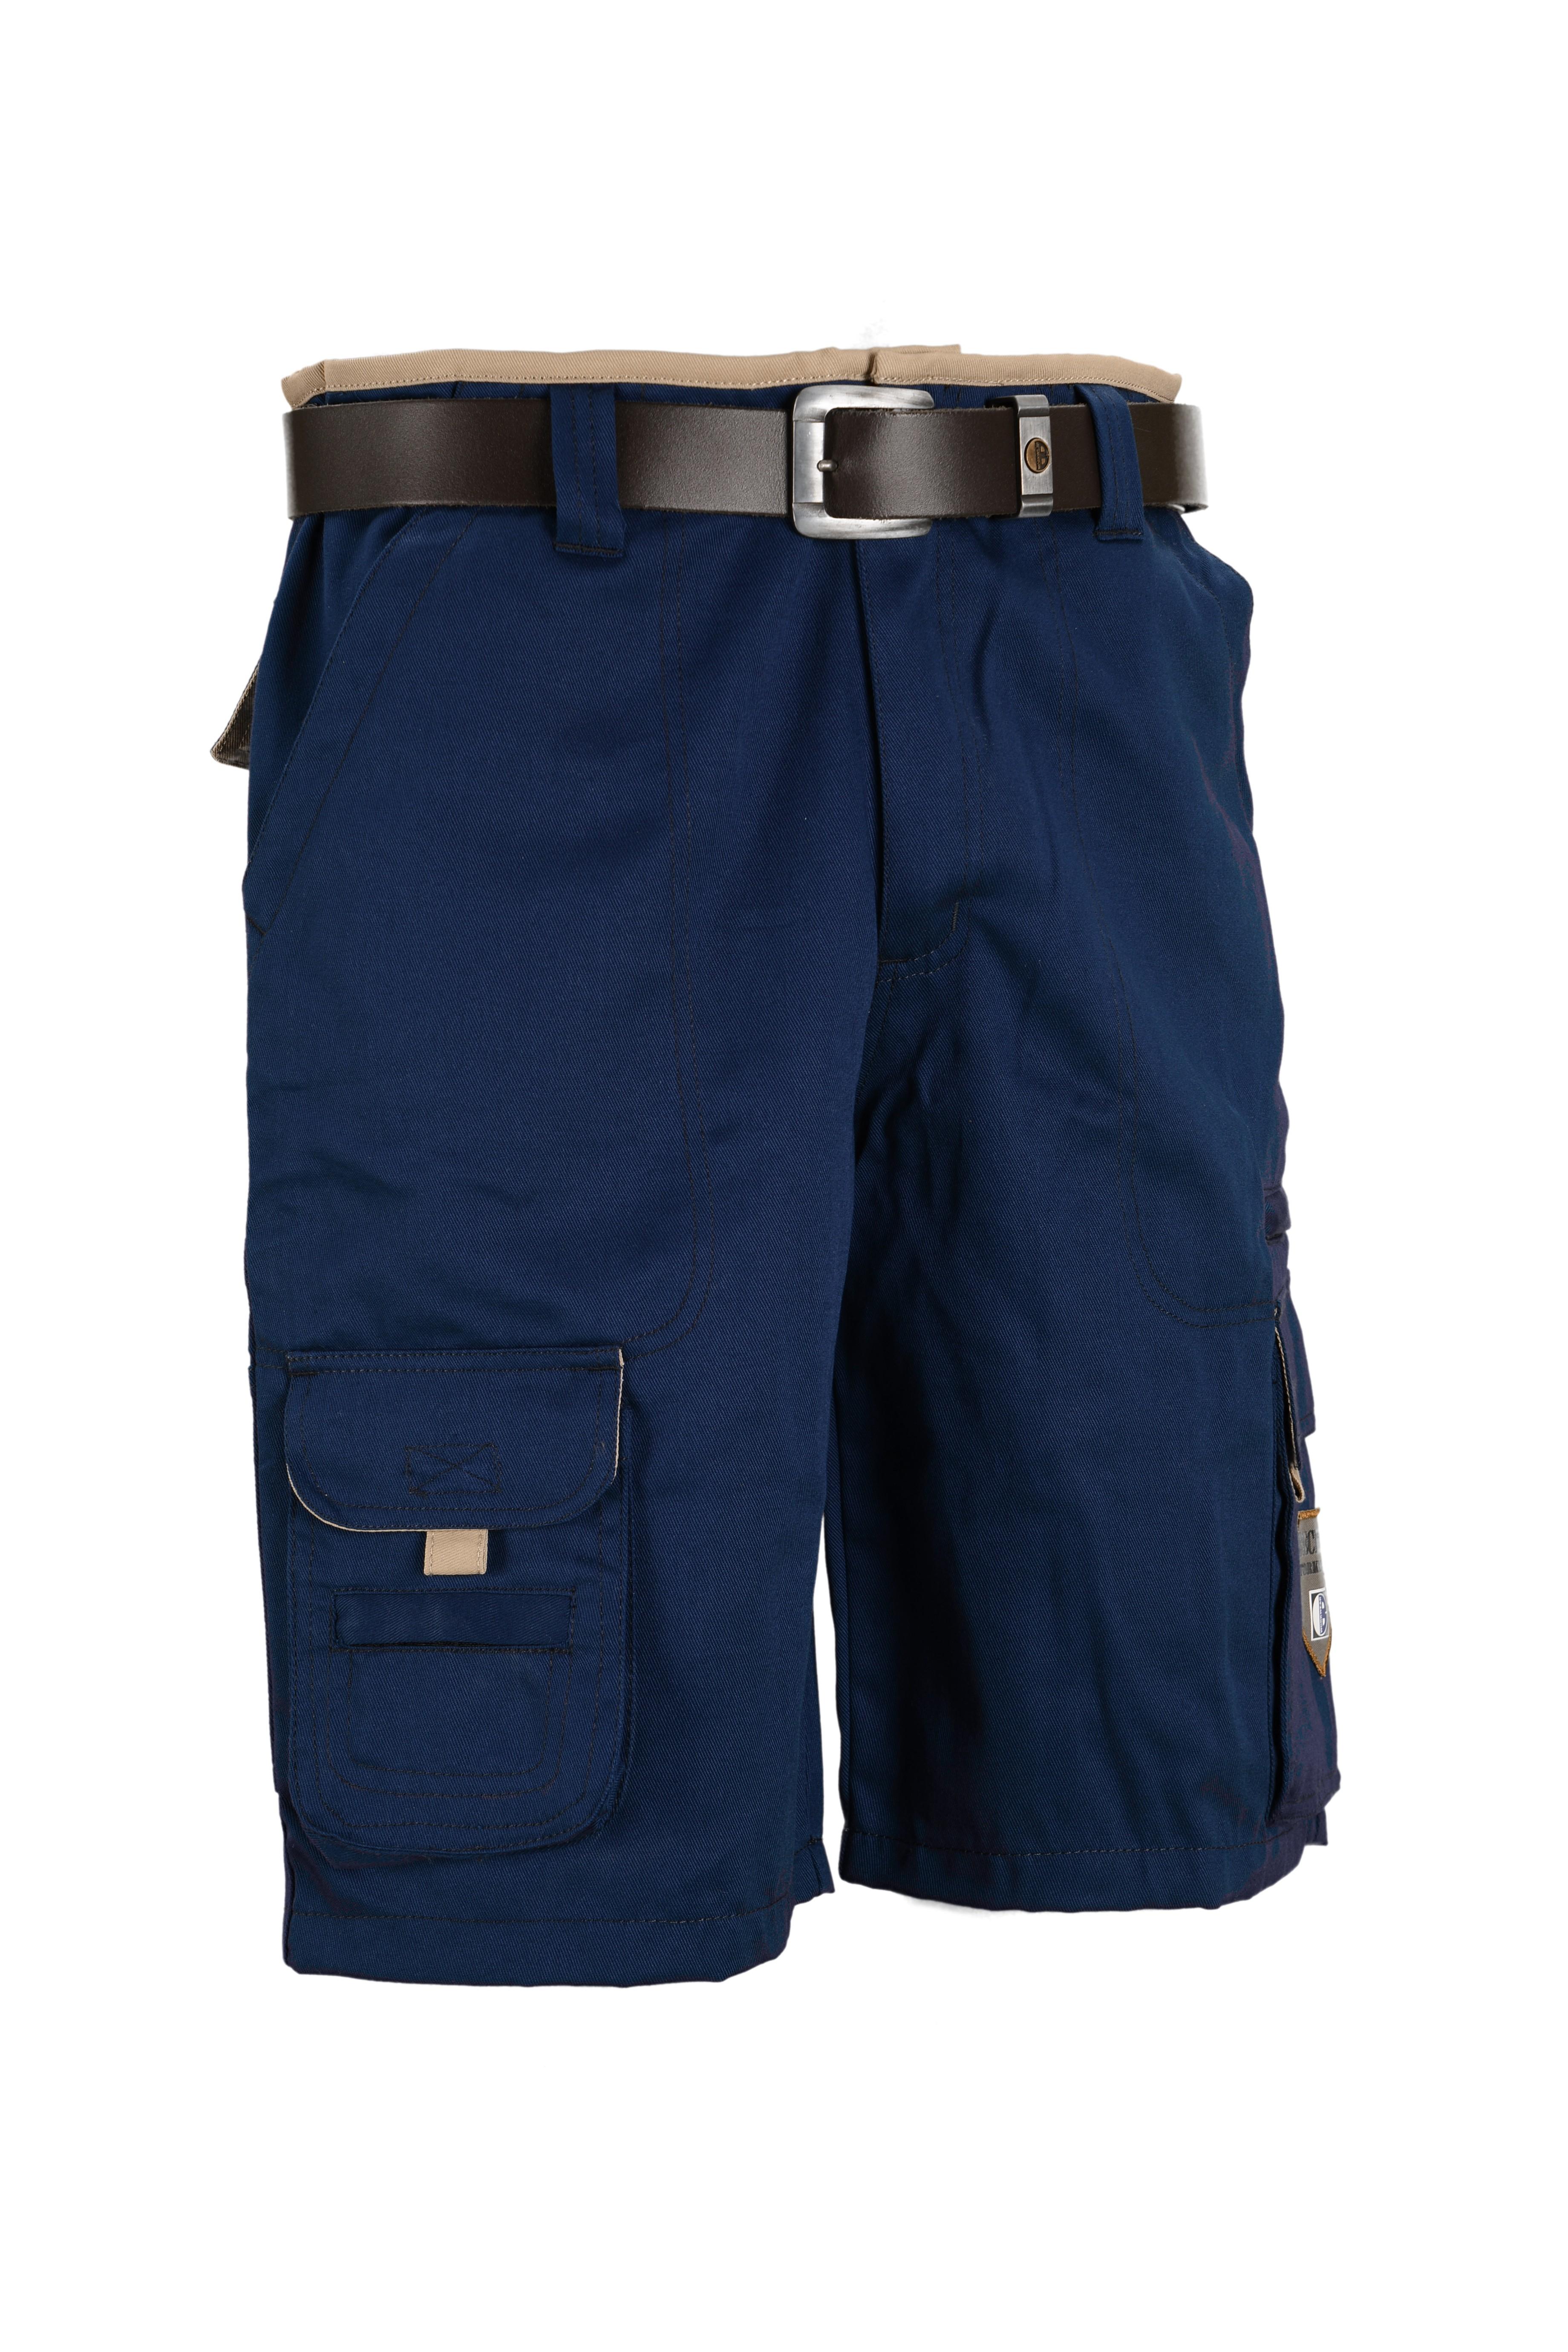 Beckum Workwear korte broek EBKB 01